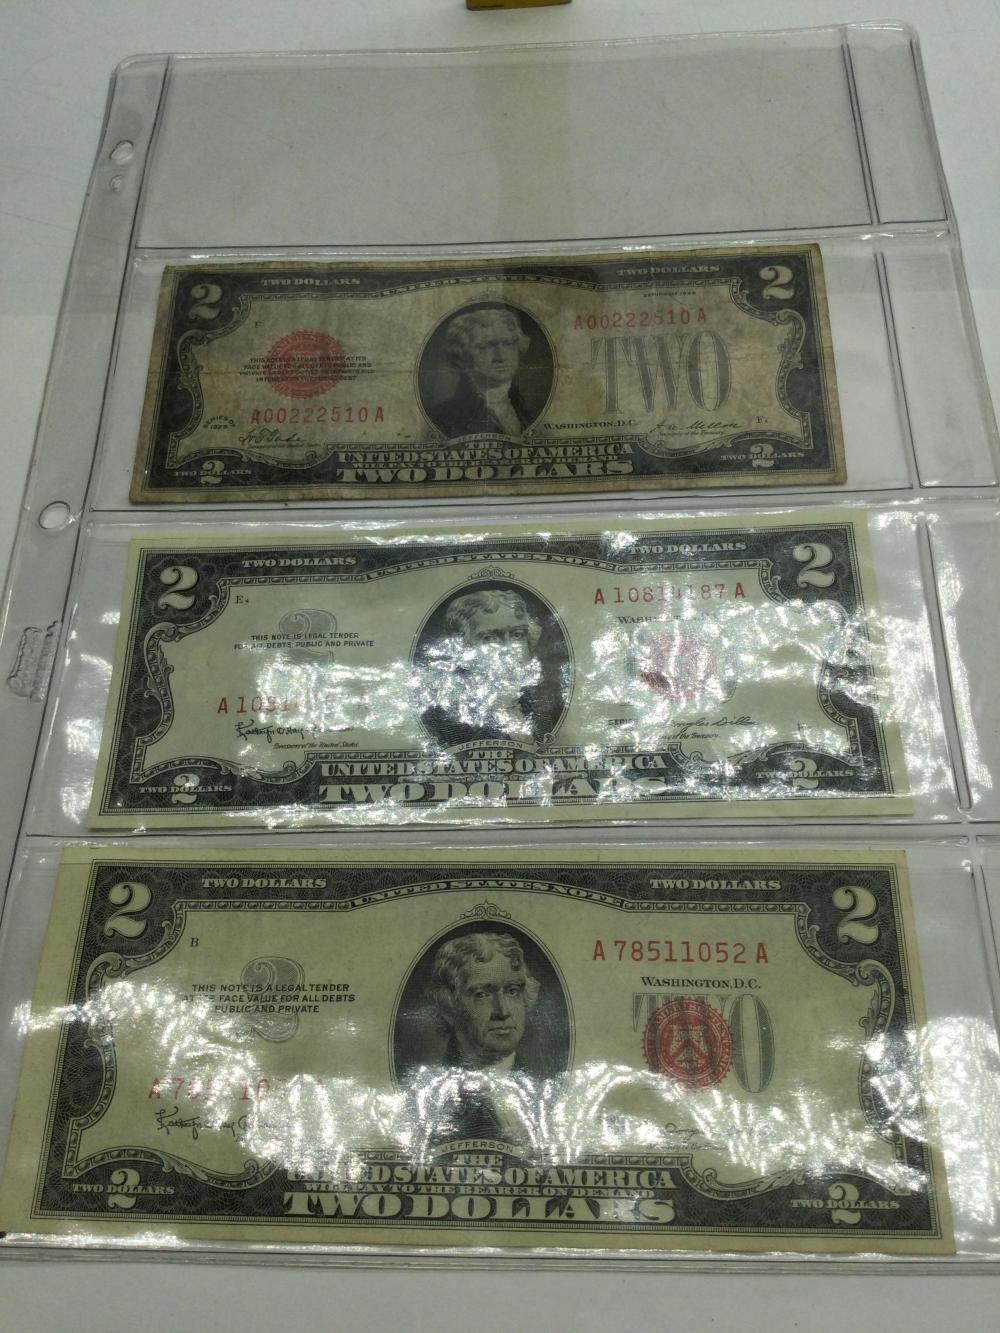 3 Older $2 Bills